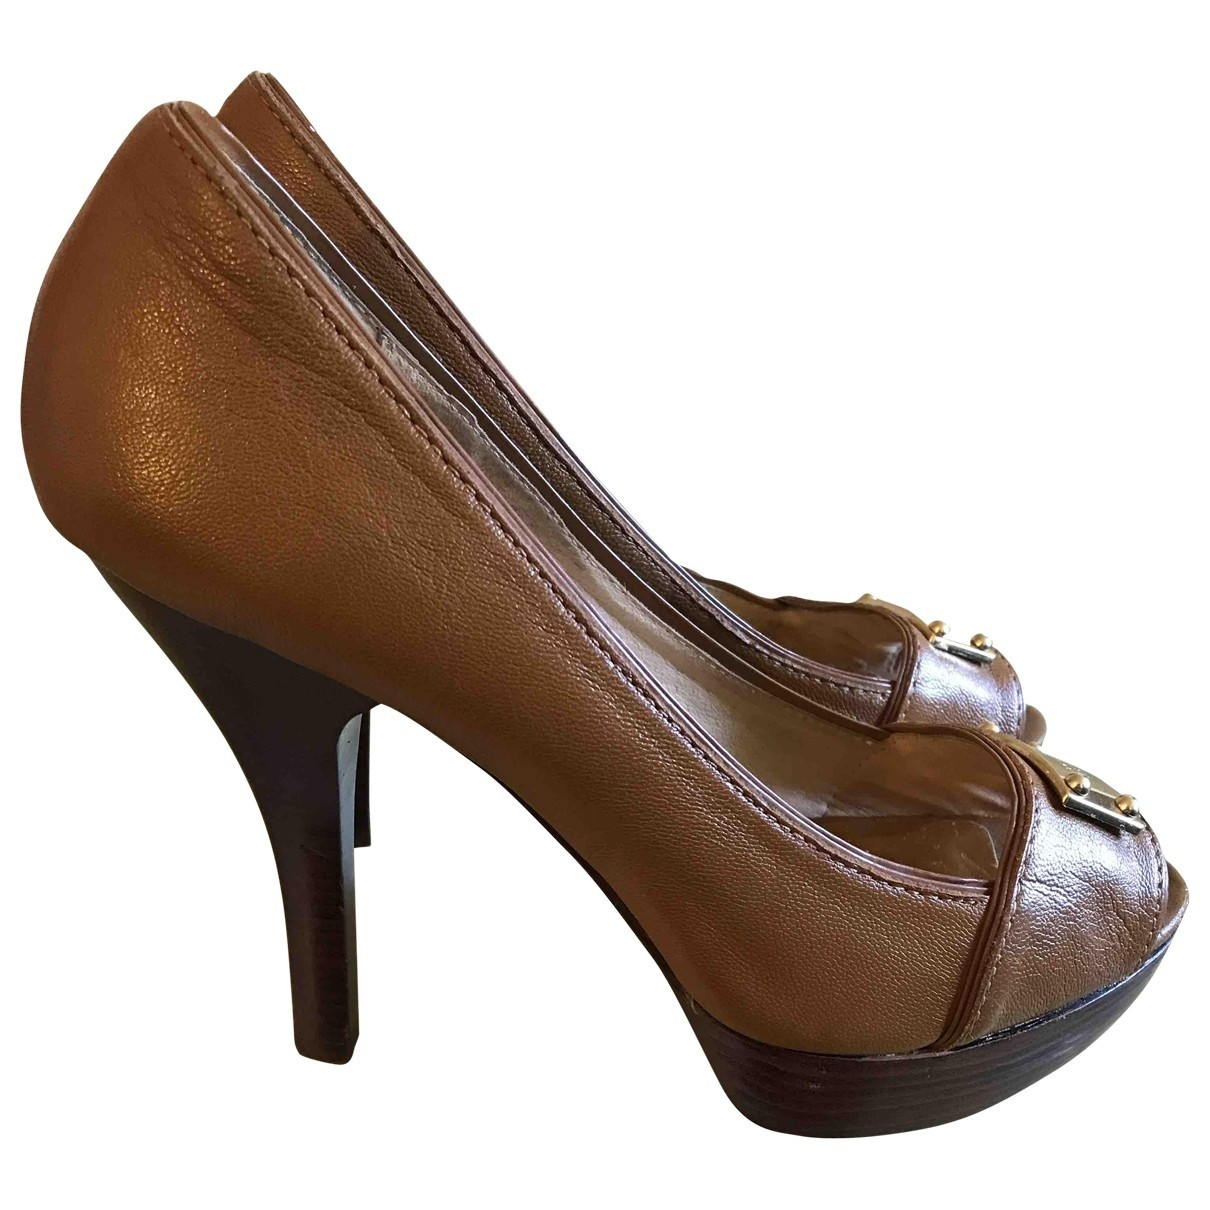 Michael Kors \N Brown Leather Heels for Women 40 EU